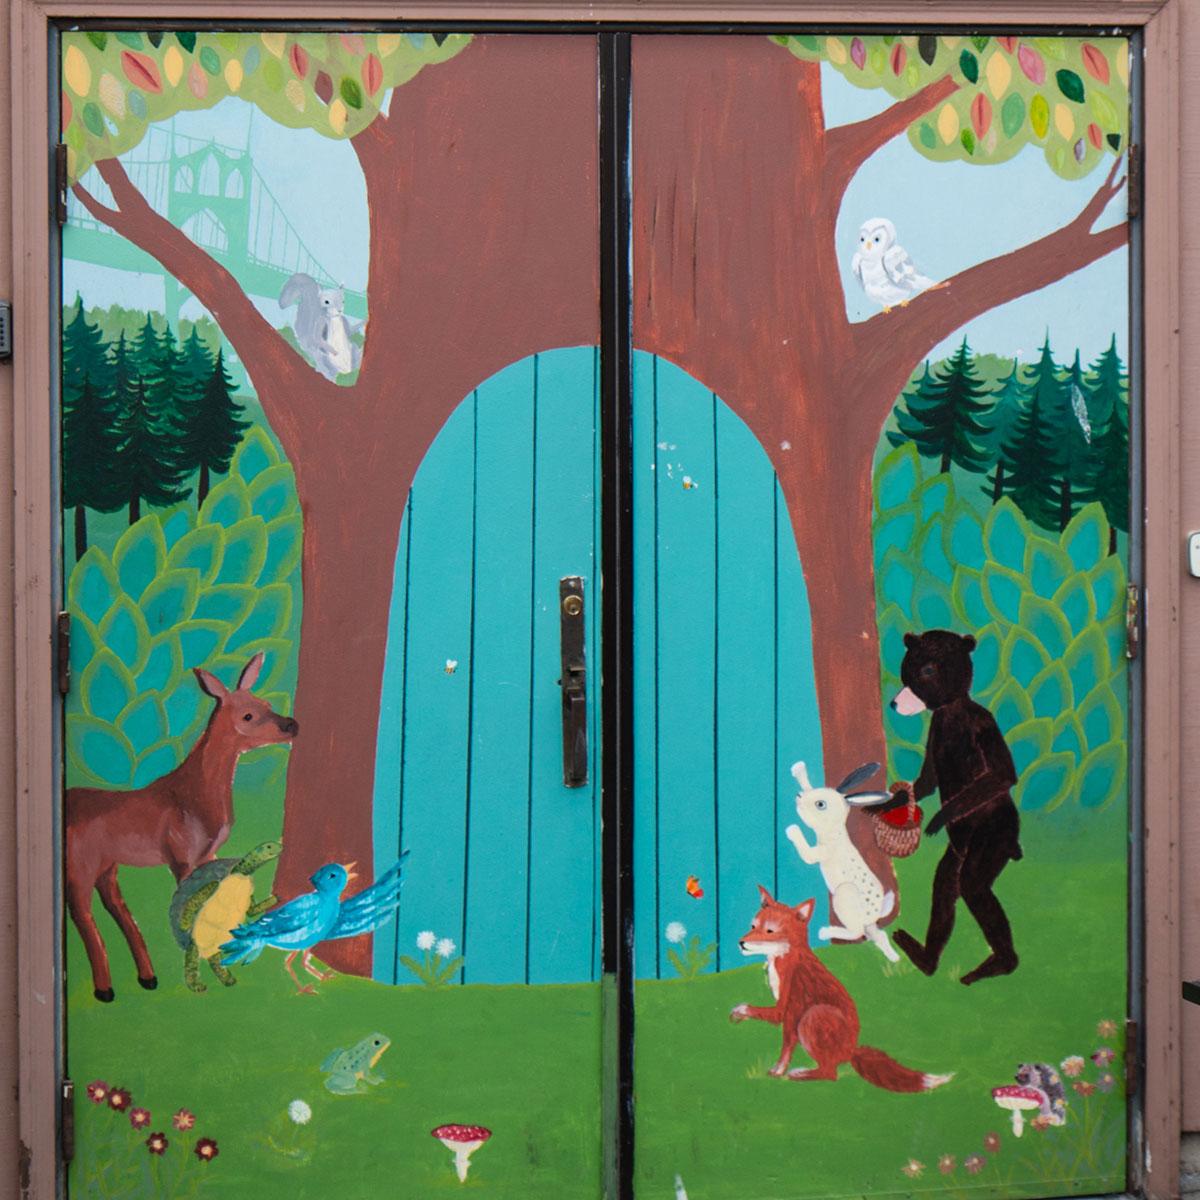 Doors at St. Johns Swapnplay